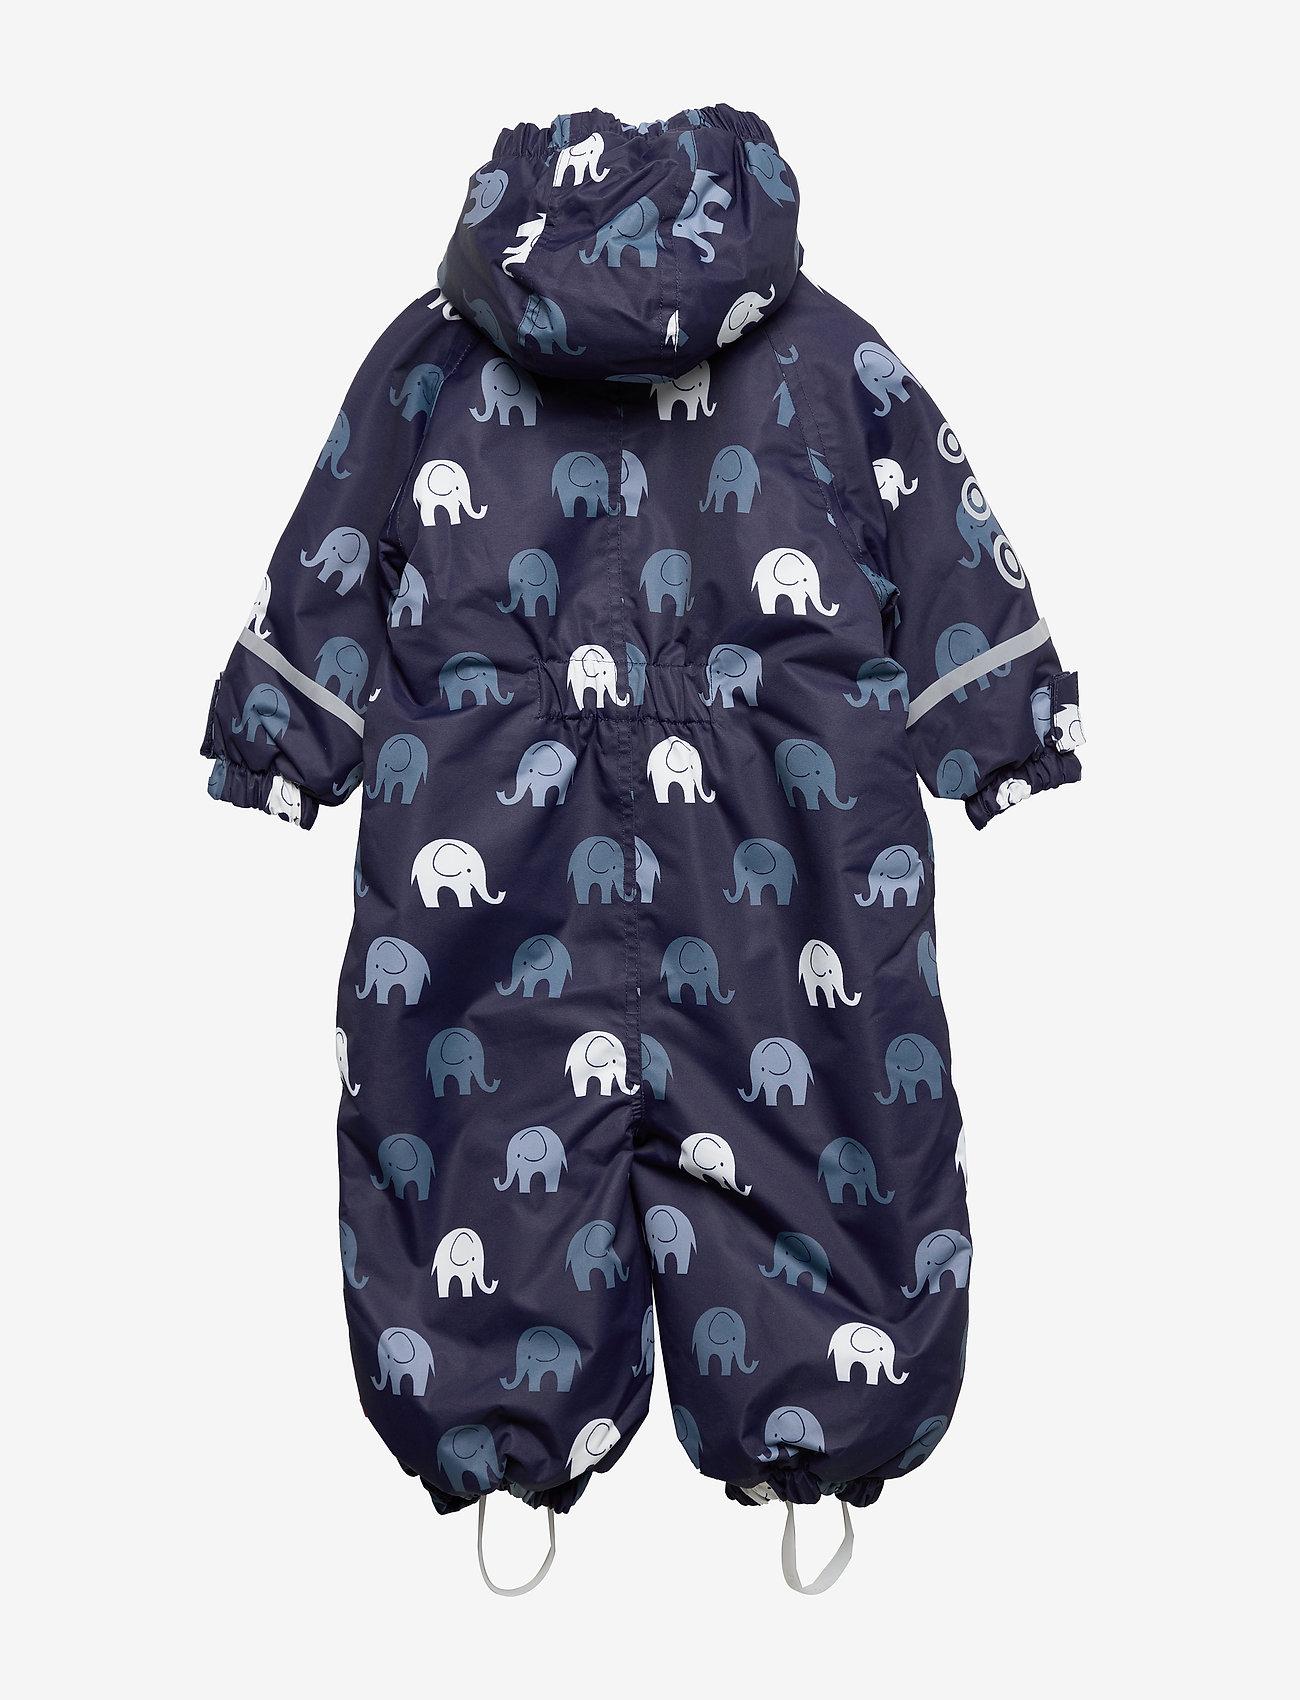 Celavi Snowsuit -elephant W 2 Zippers - Overaller Navy